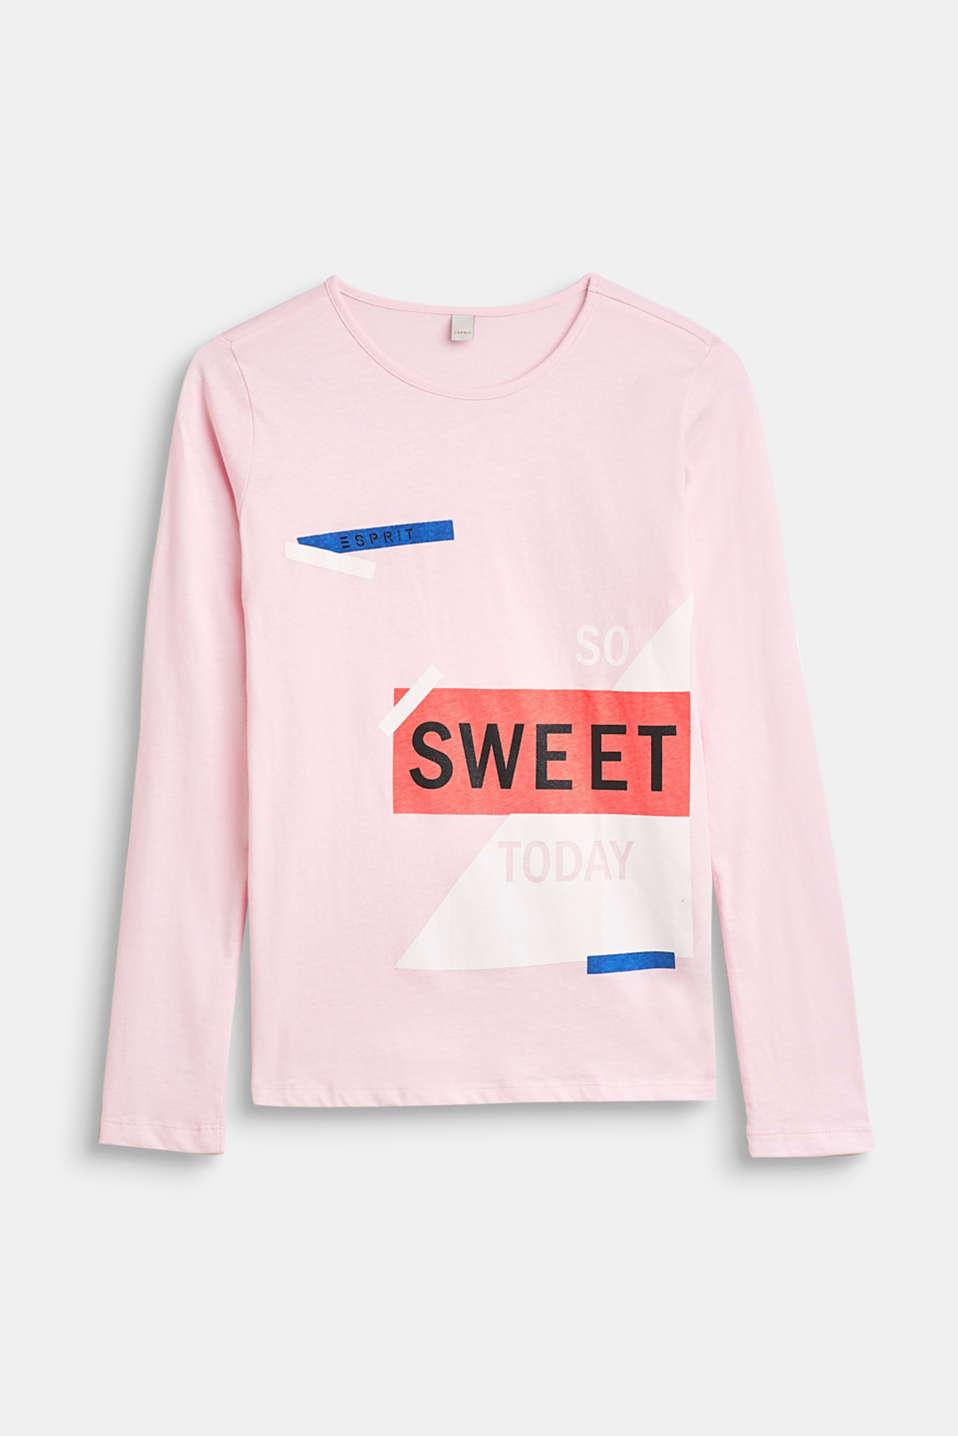 Statement print long sleeve top, 100% cotton, LCBLUSH, detail image number 0